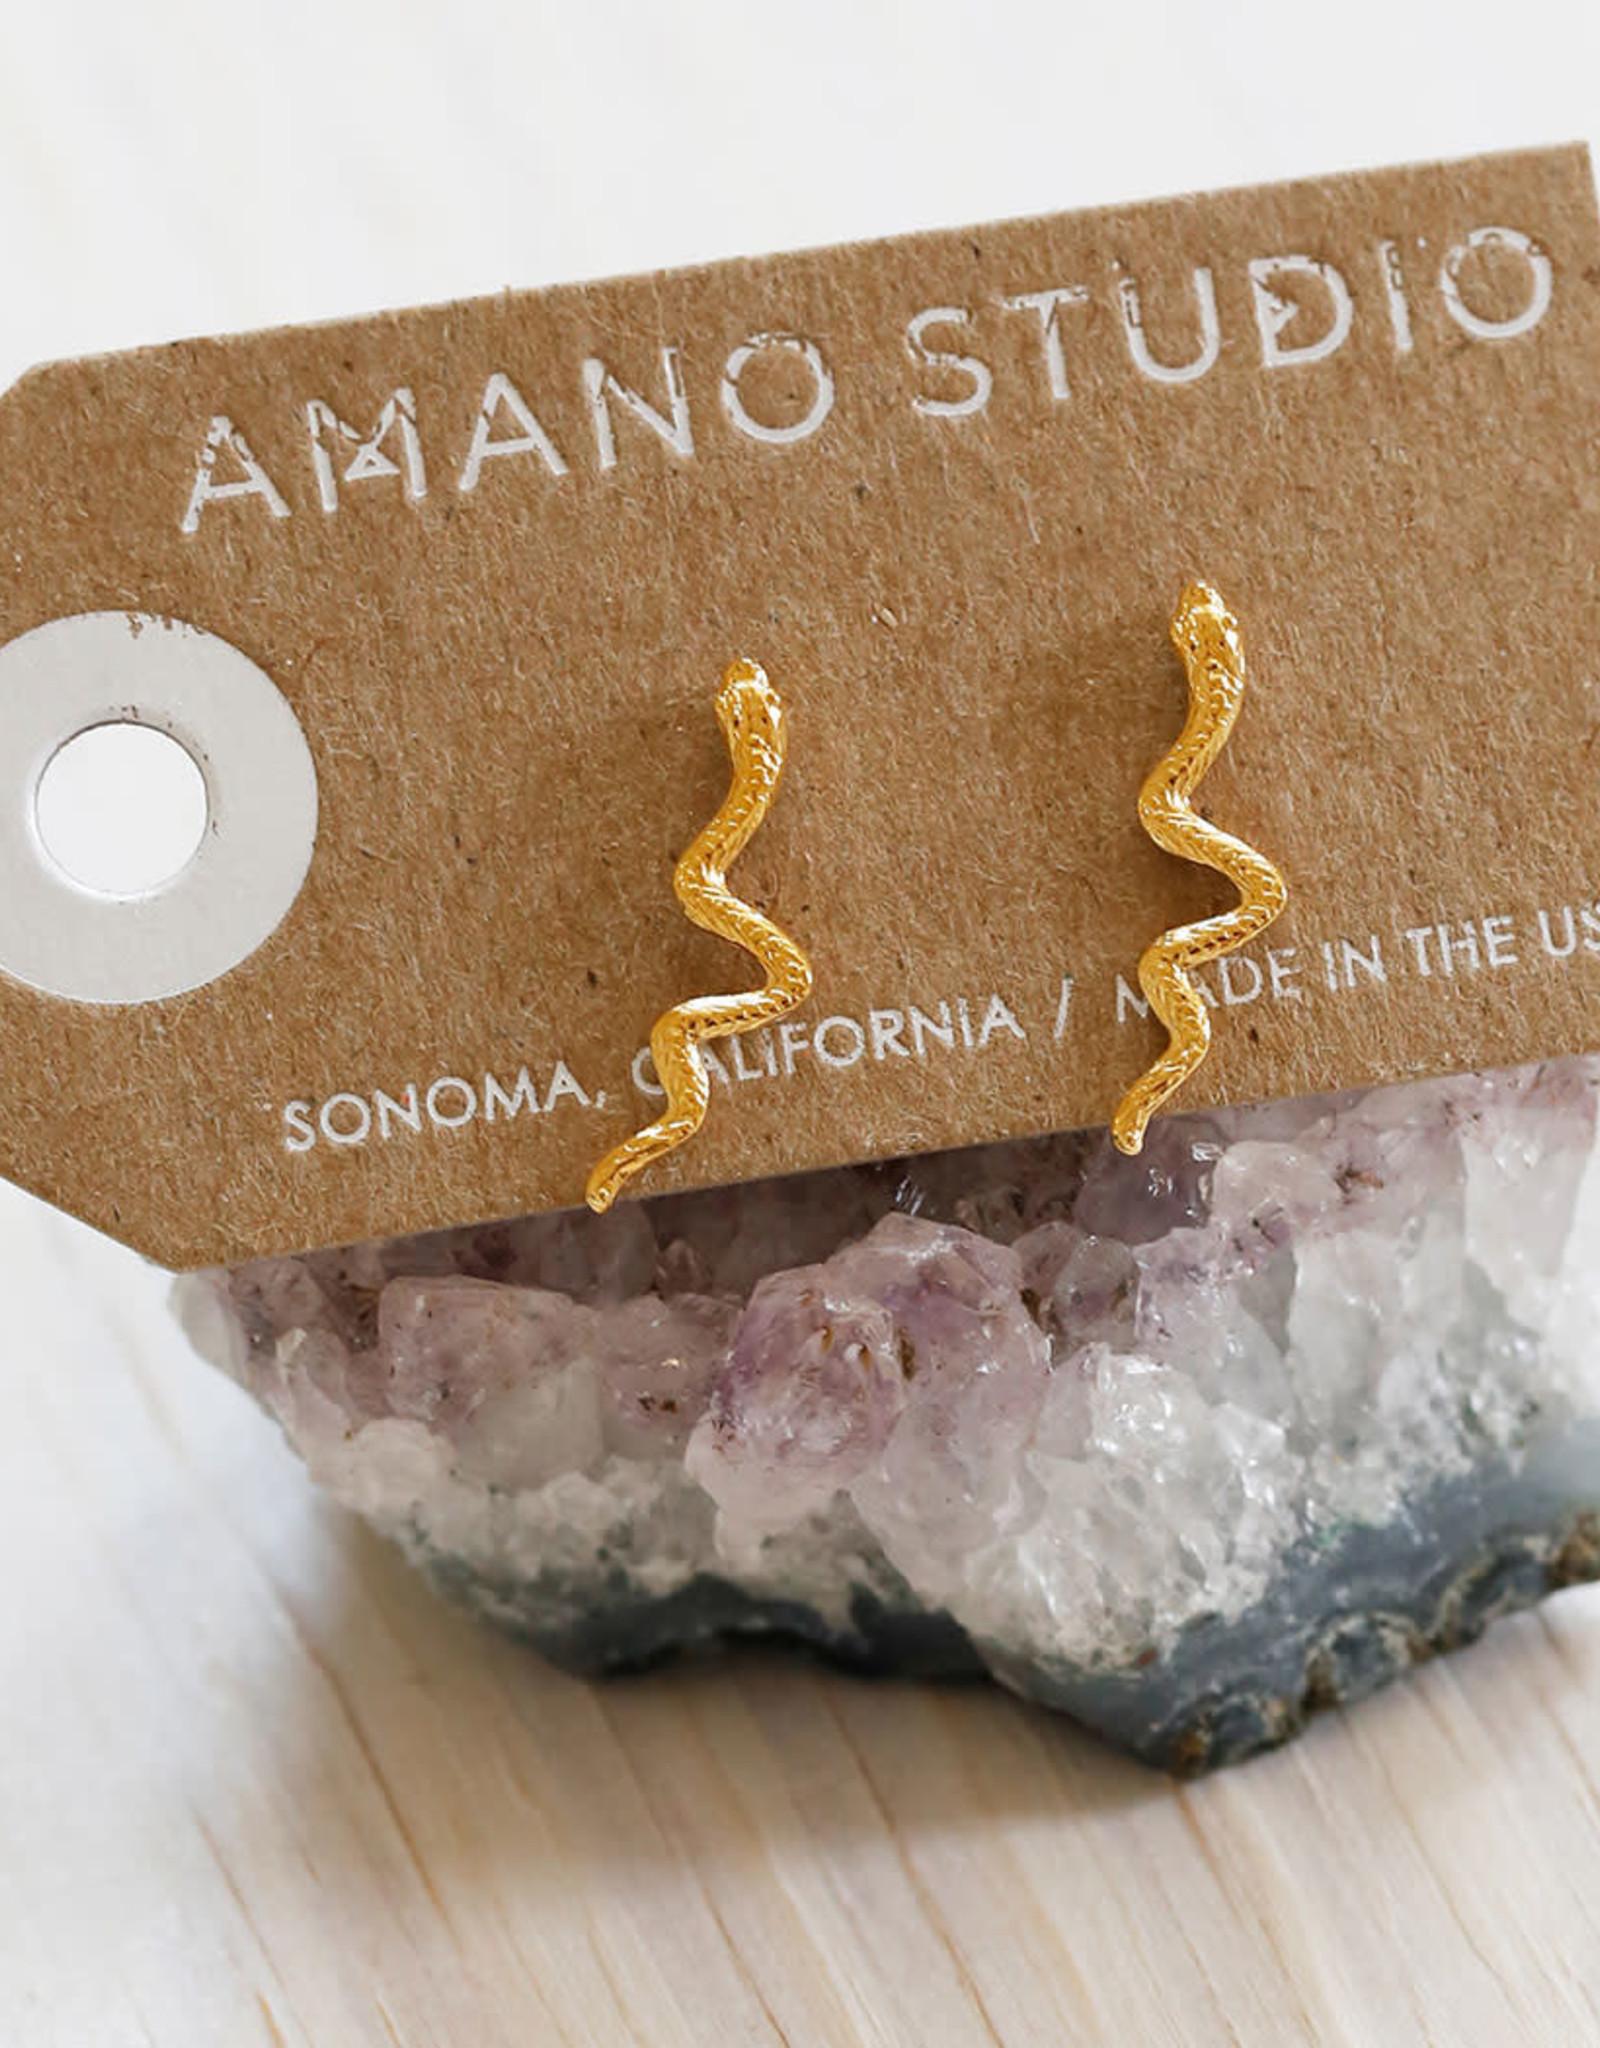 Faire/Amano Studio EARRINGS-SERPENT STUDS